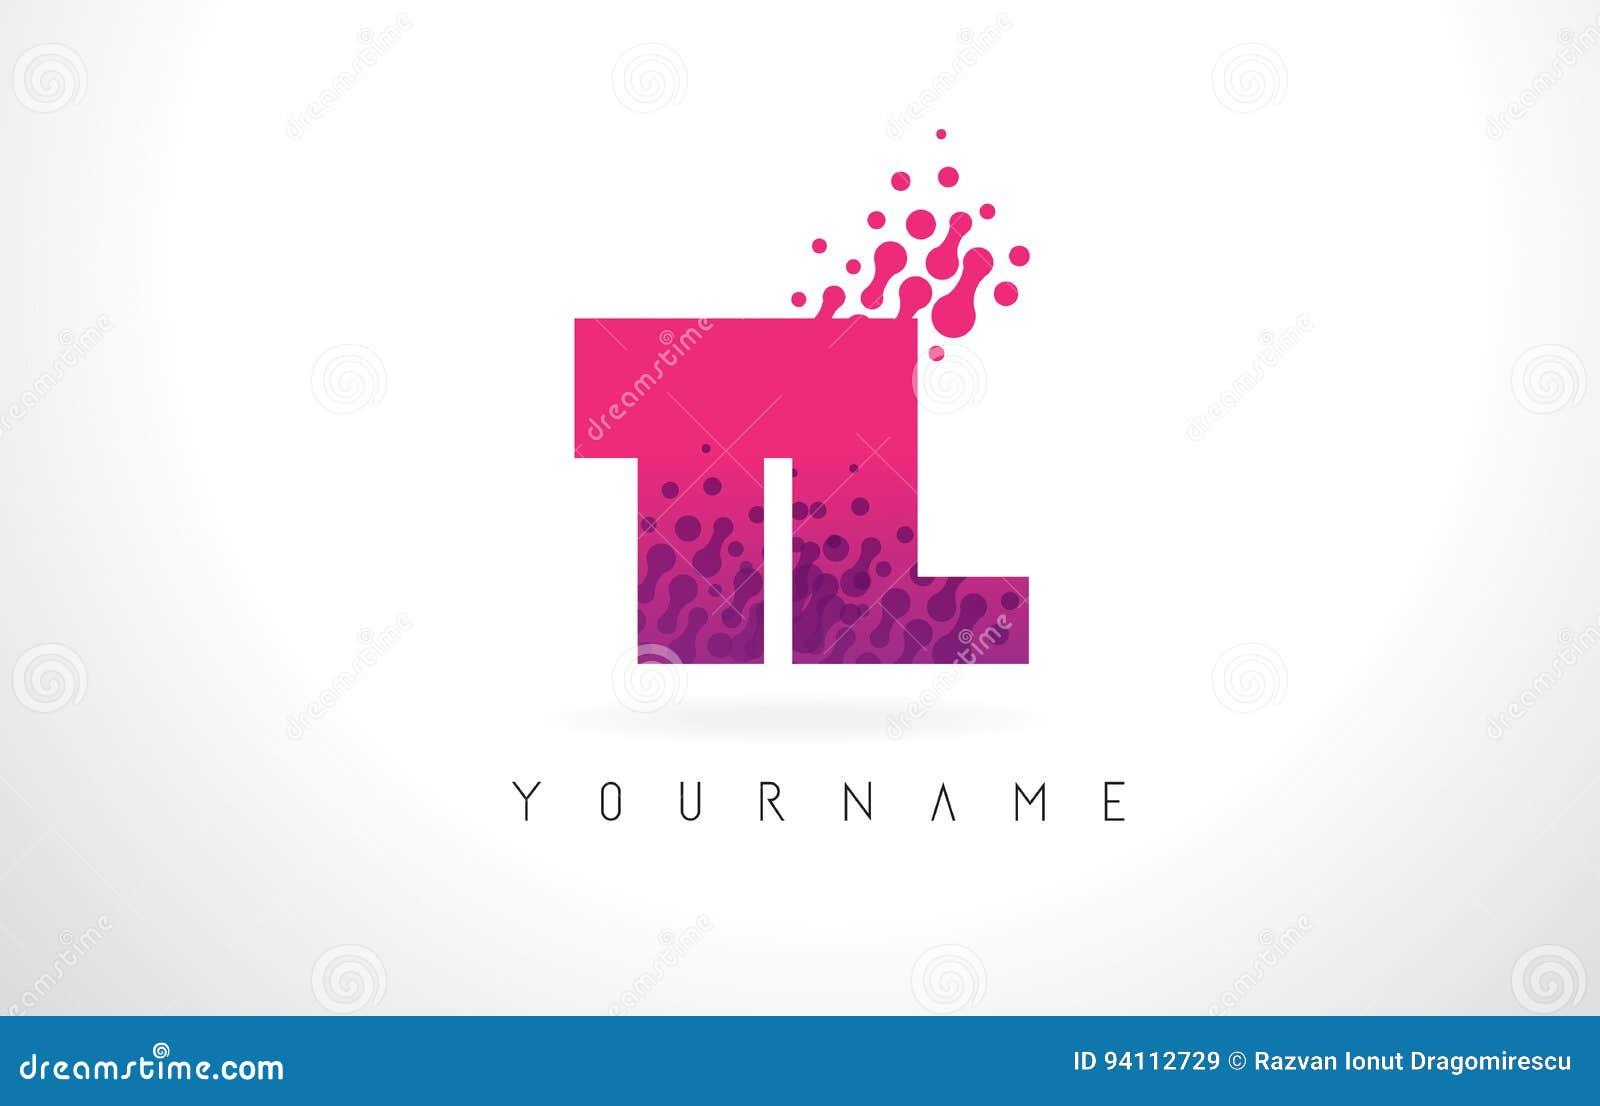 TL T L Letter Logo With Pink Purple Color And Particles Dots Des ...